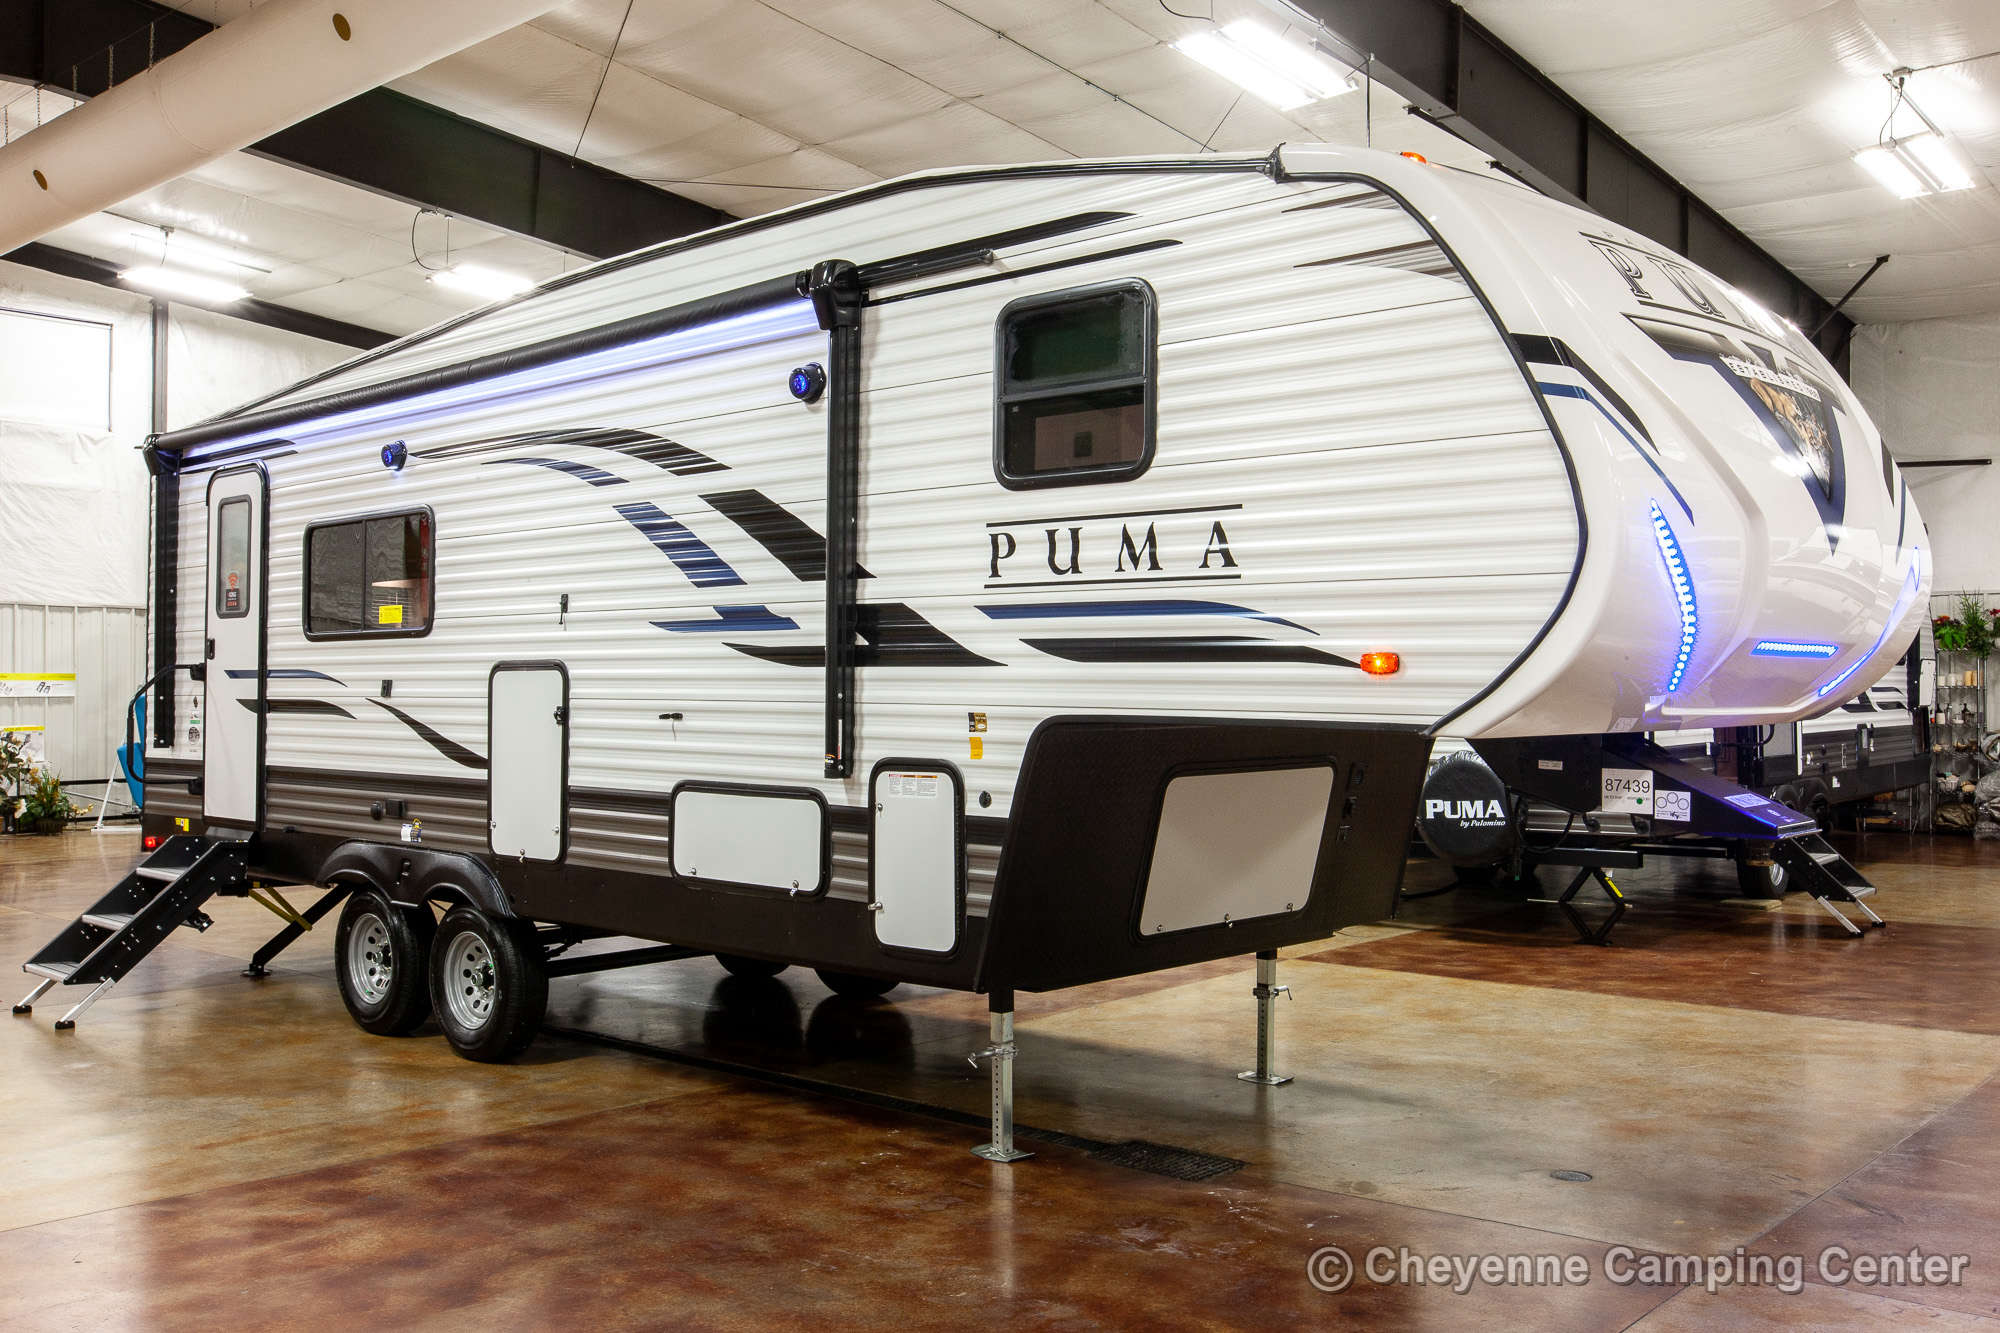 2021 Palomino Puma 255RKS Fifth Wheel